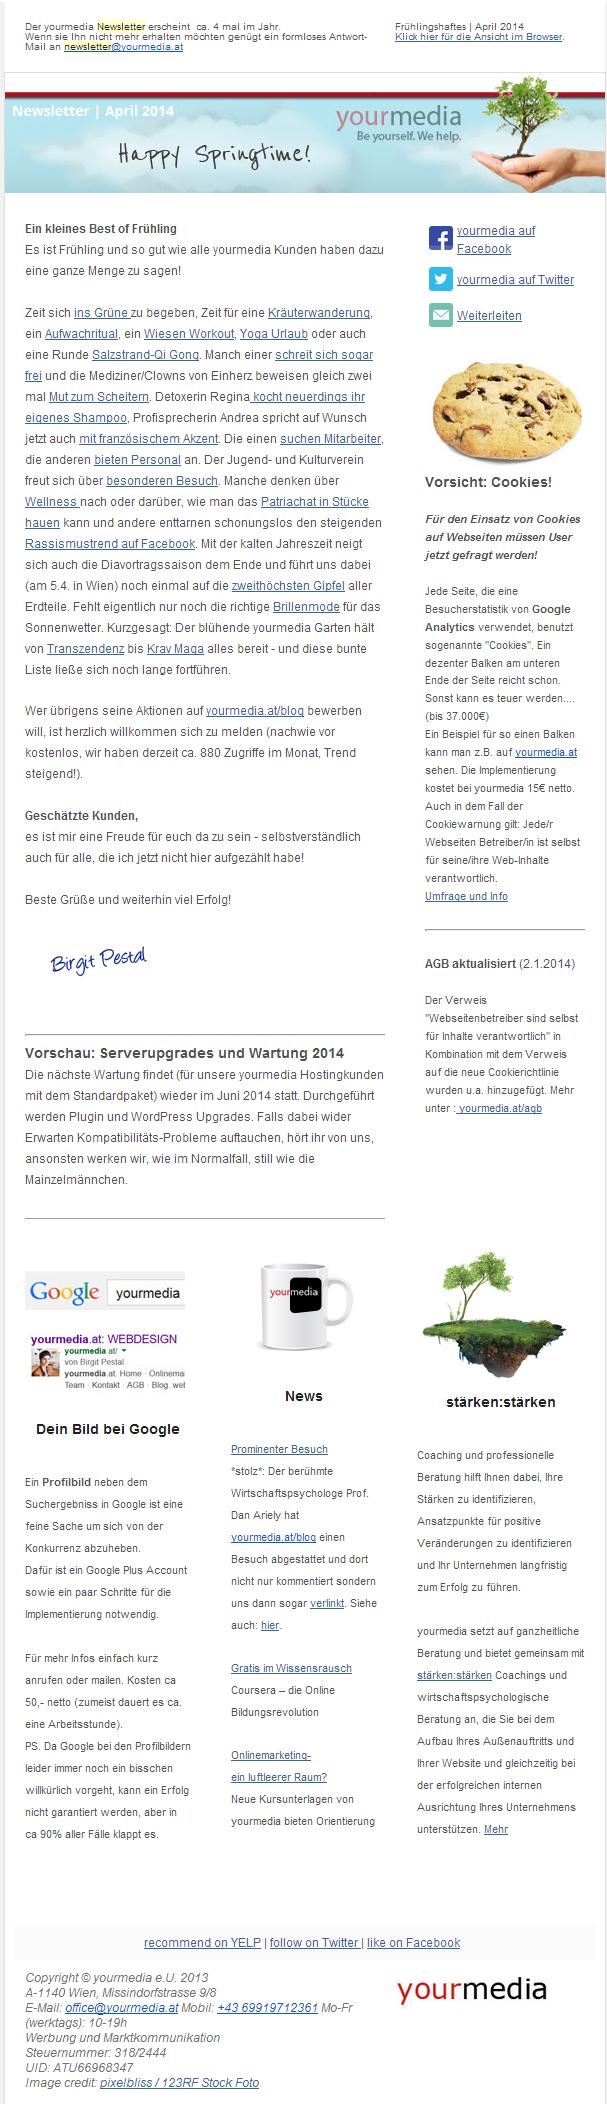 yourmedia-newsletter-1-2014